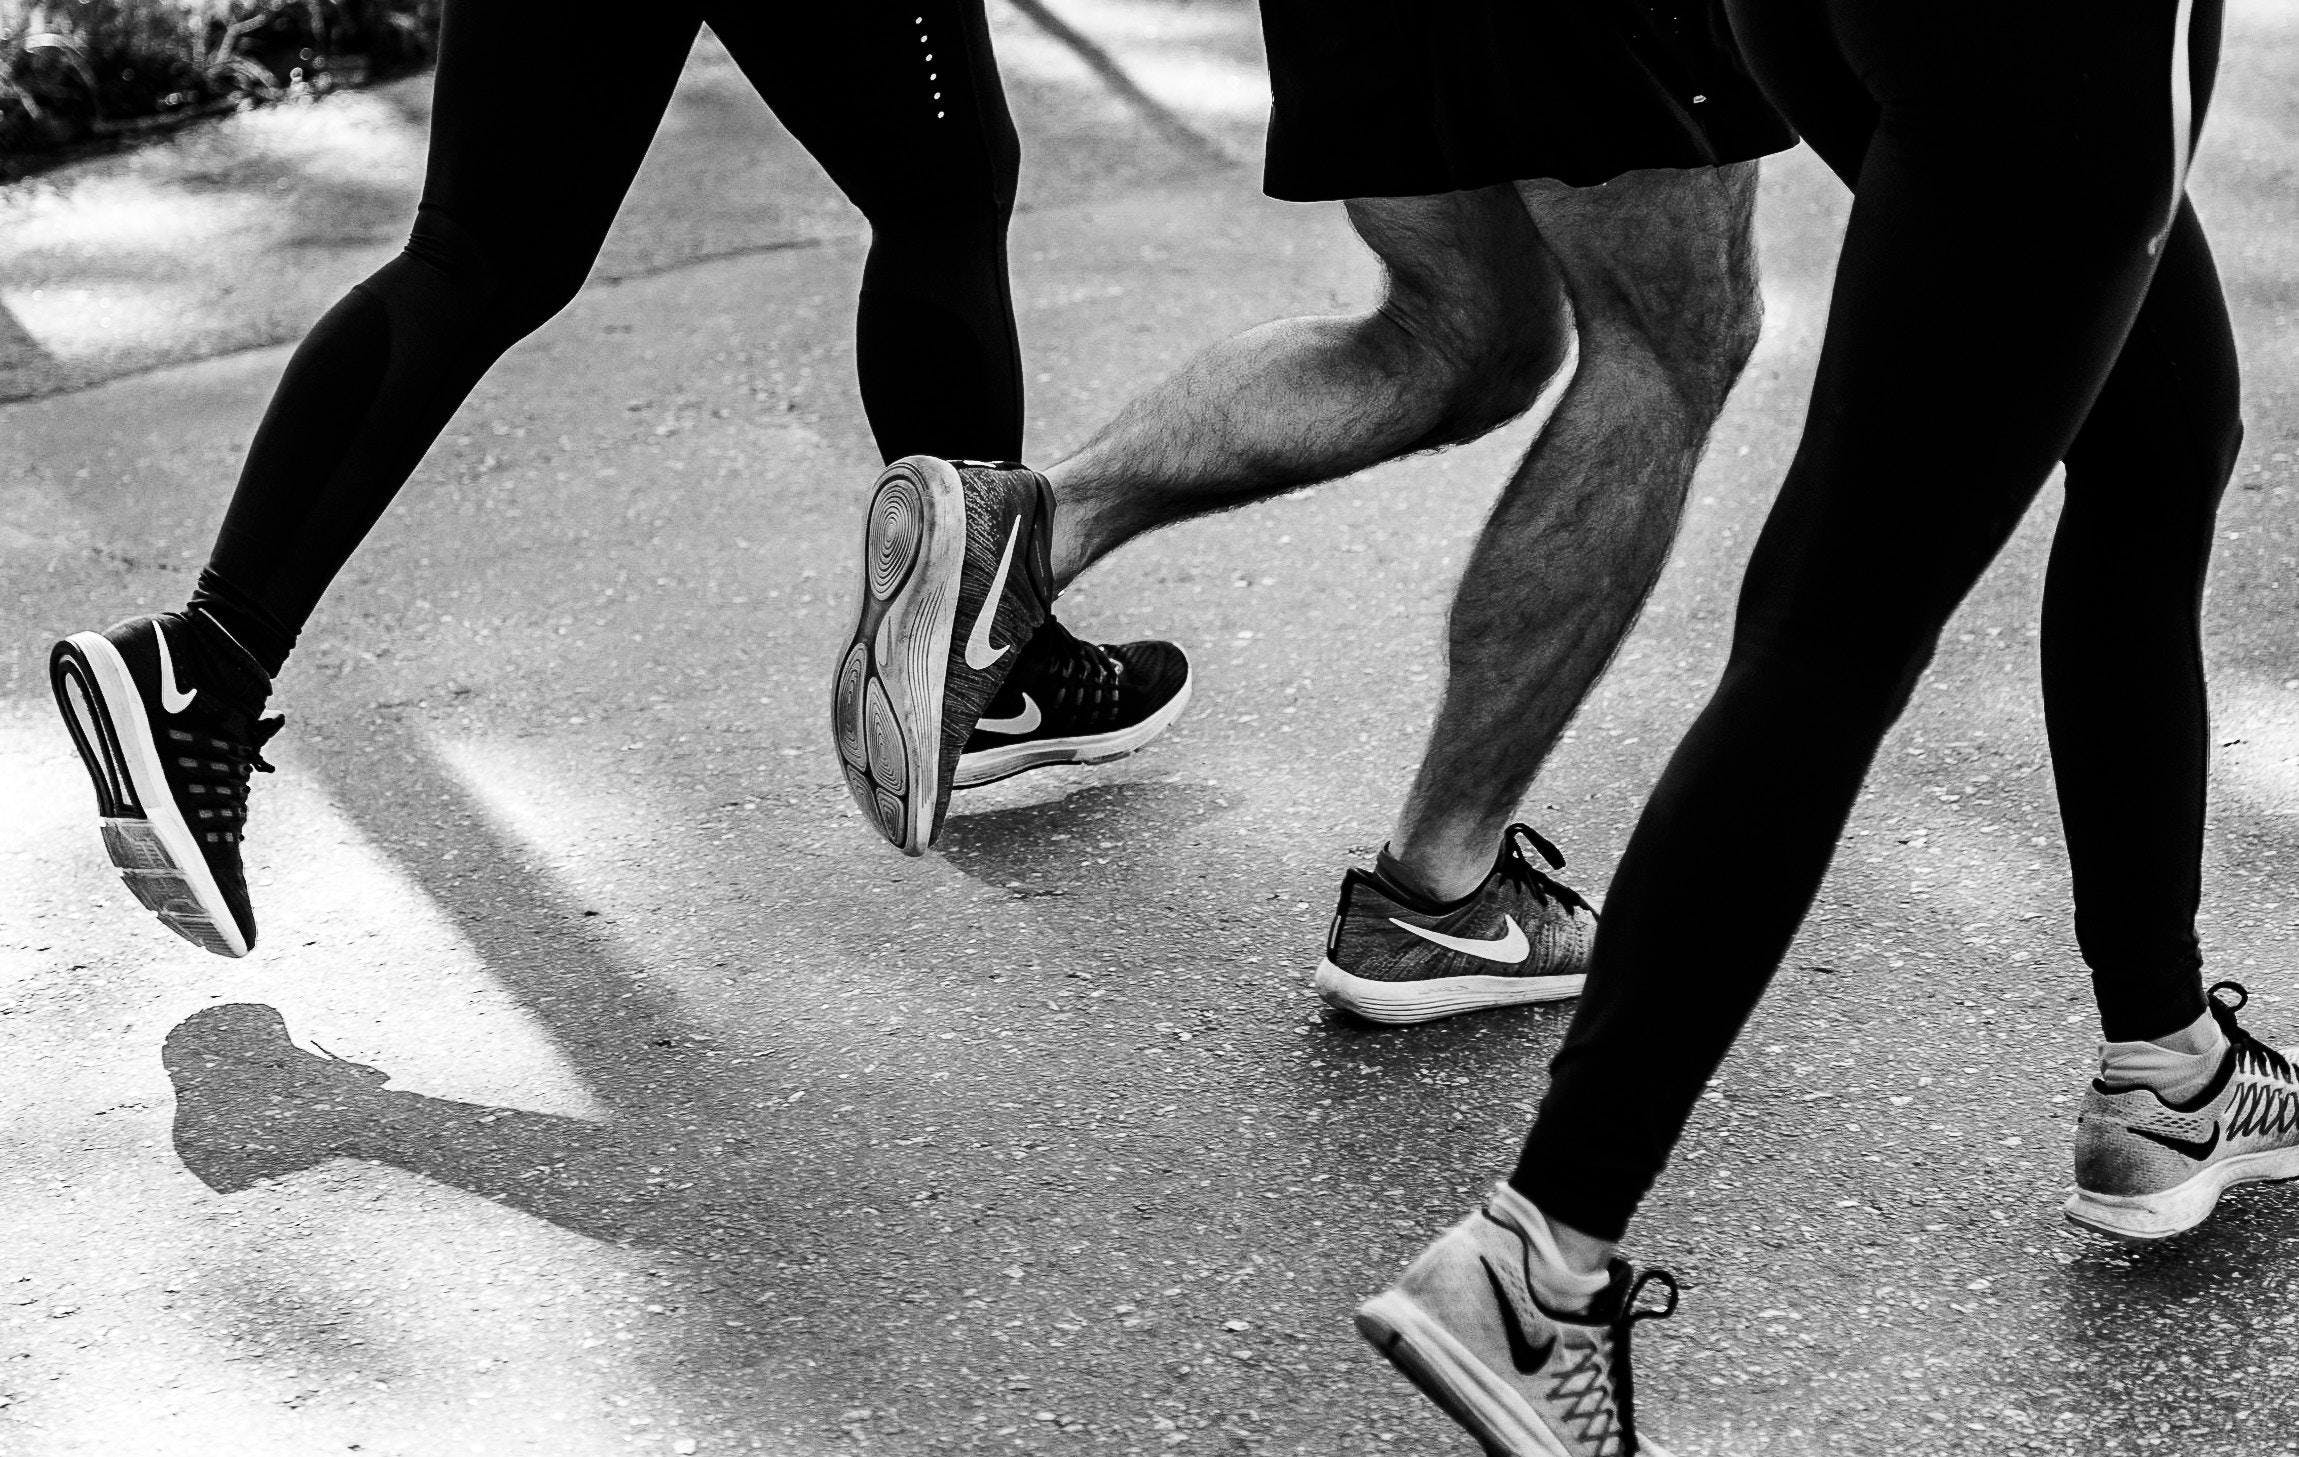 Yoga for Runners workshop - Lower Body